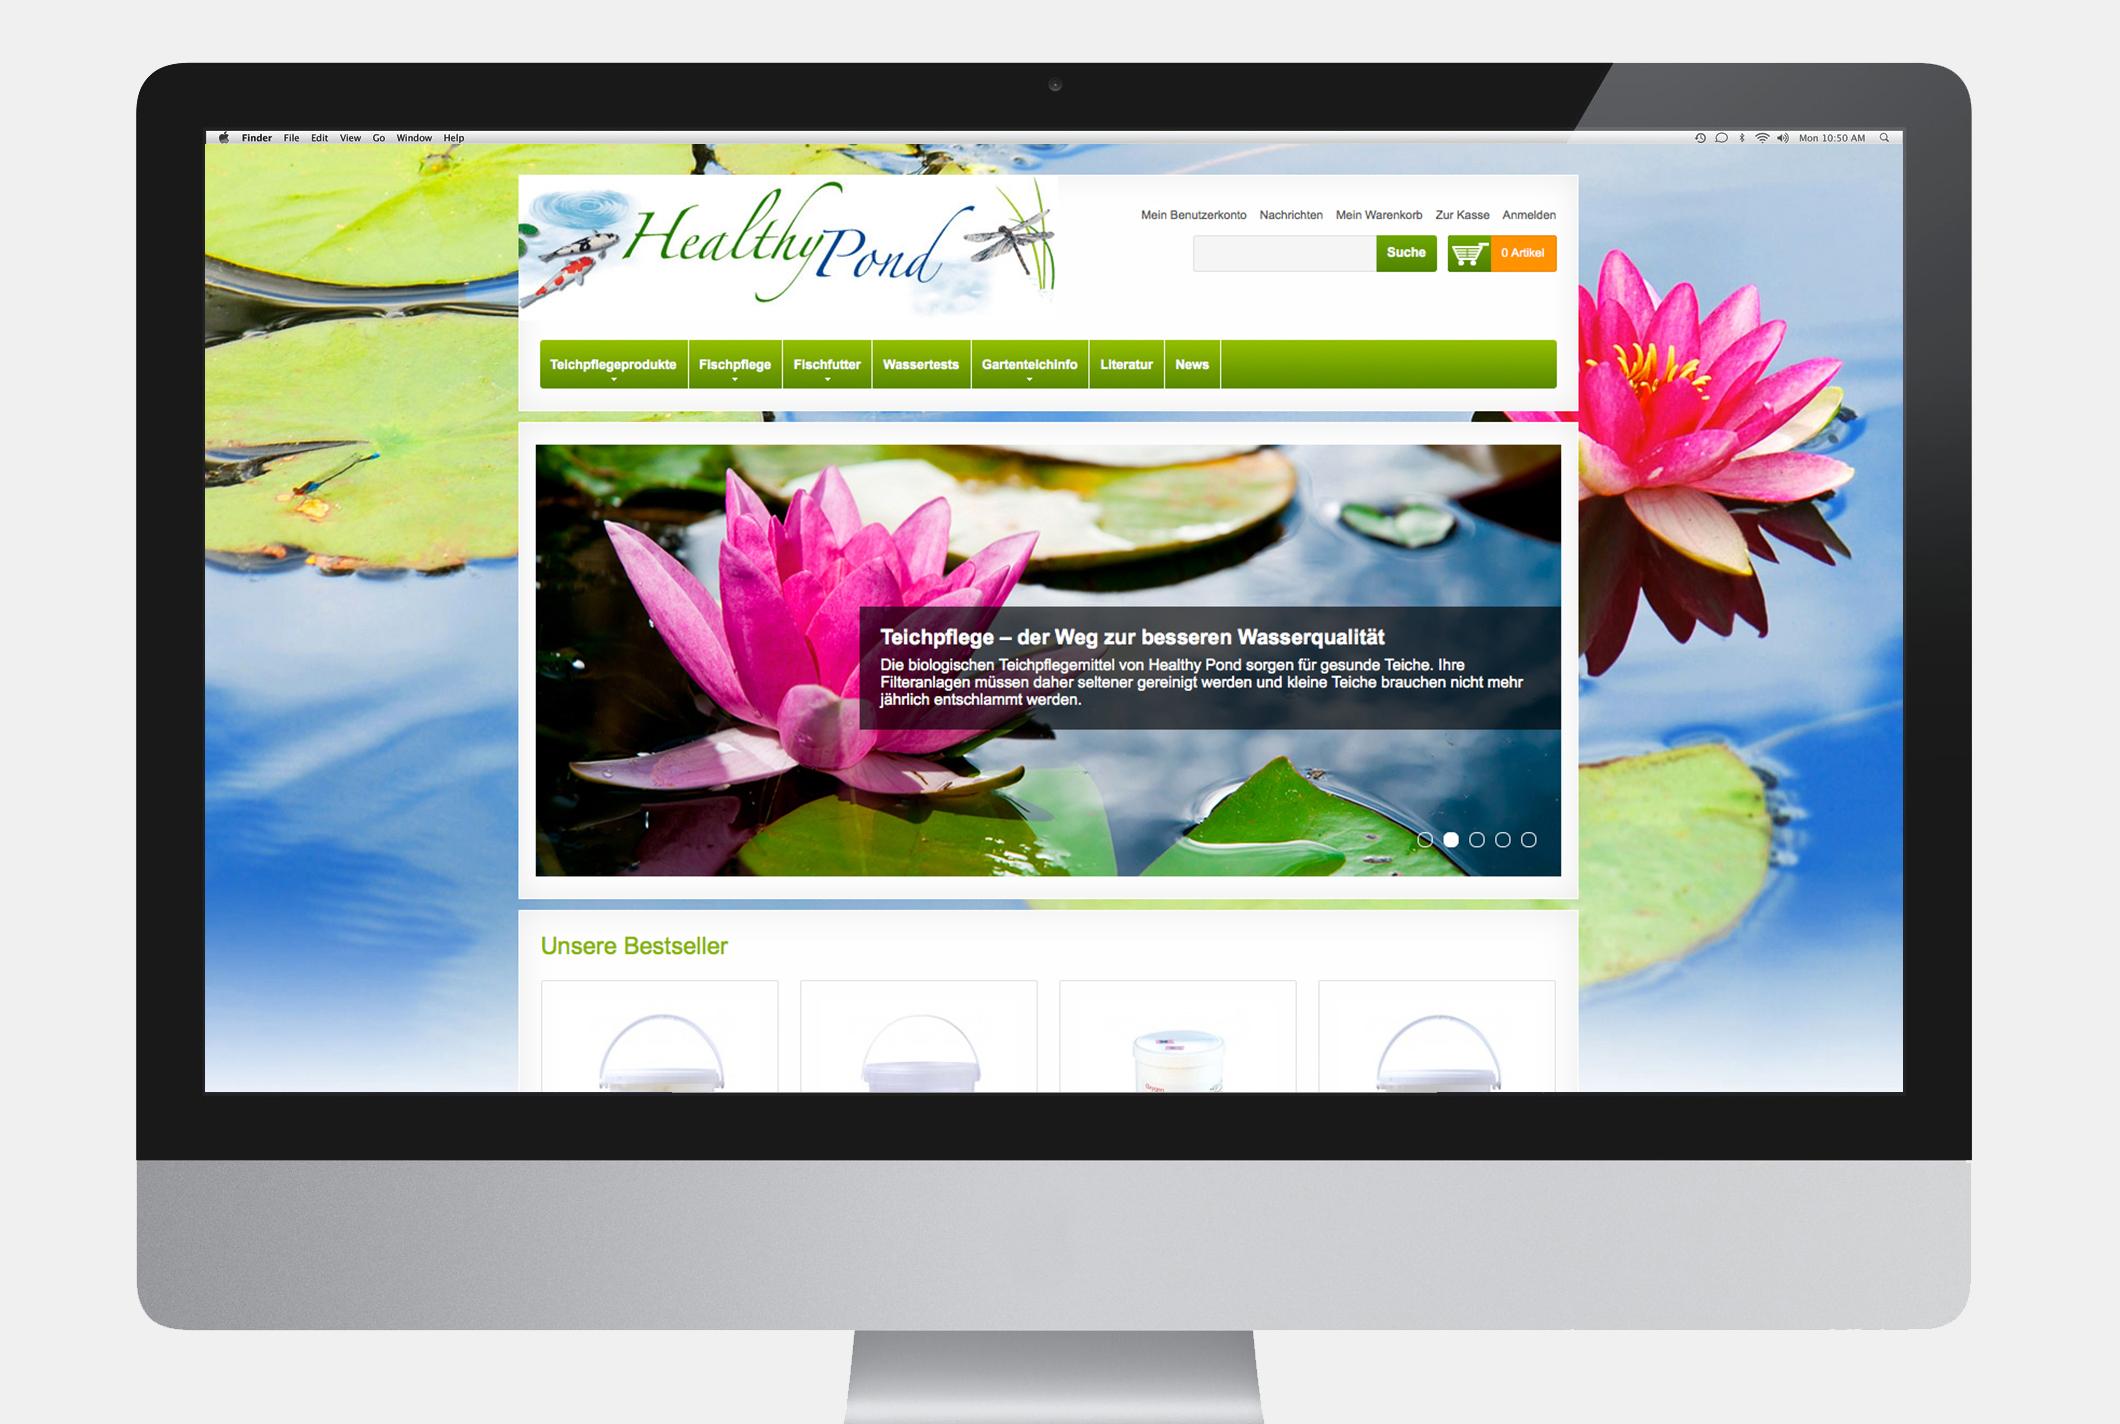 Healthy Pond Webshop